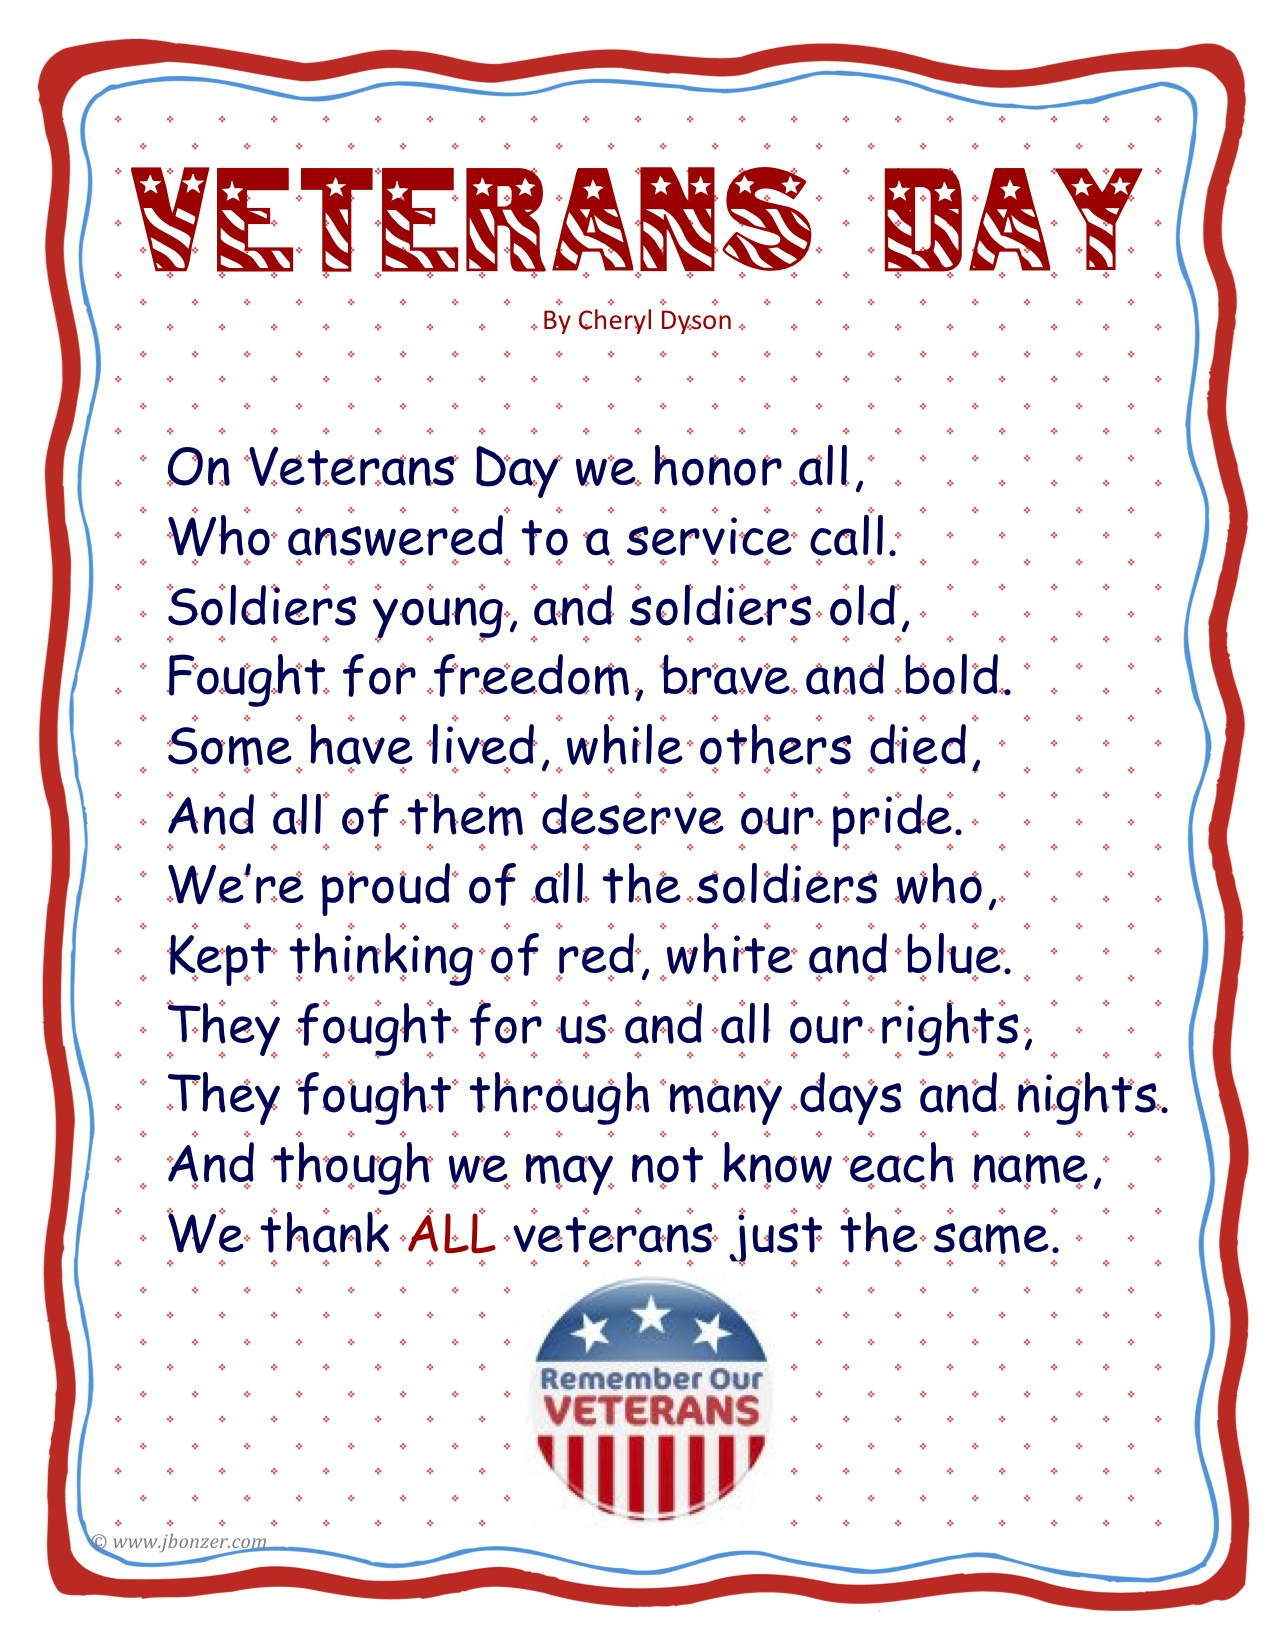 019 Essay Example Veteransdaypoembyjudybonzer3 Tuck Mba Marvelous Essays Sample Tips 2018 Full